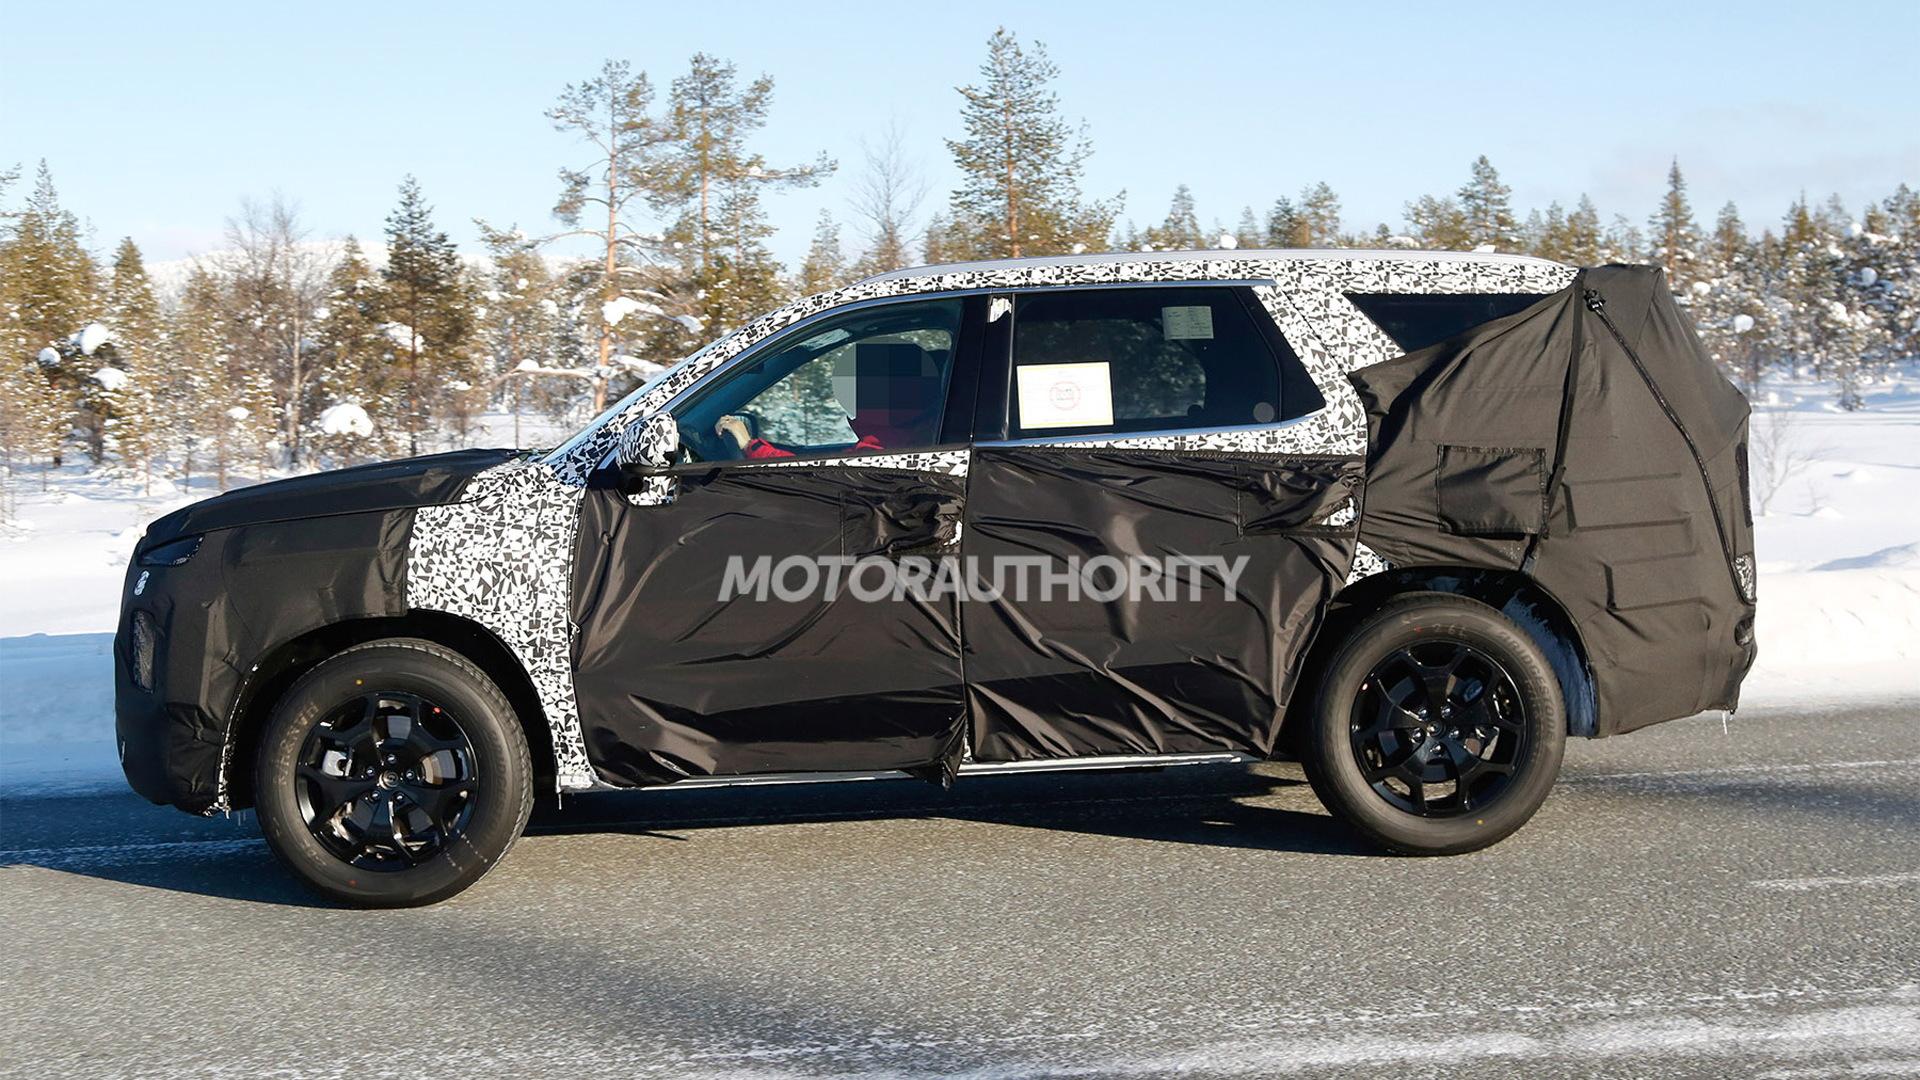 2020 Hyundai Palisade spy shots - Image via S. Baldauf/SB-Medien